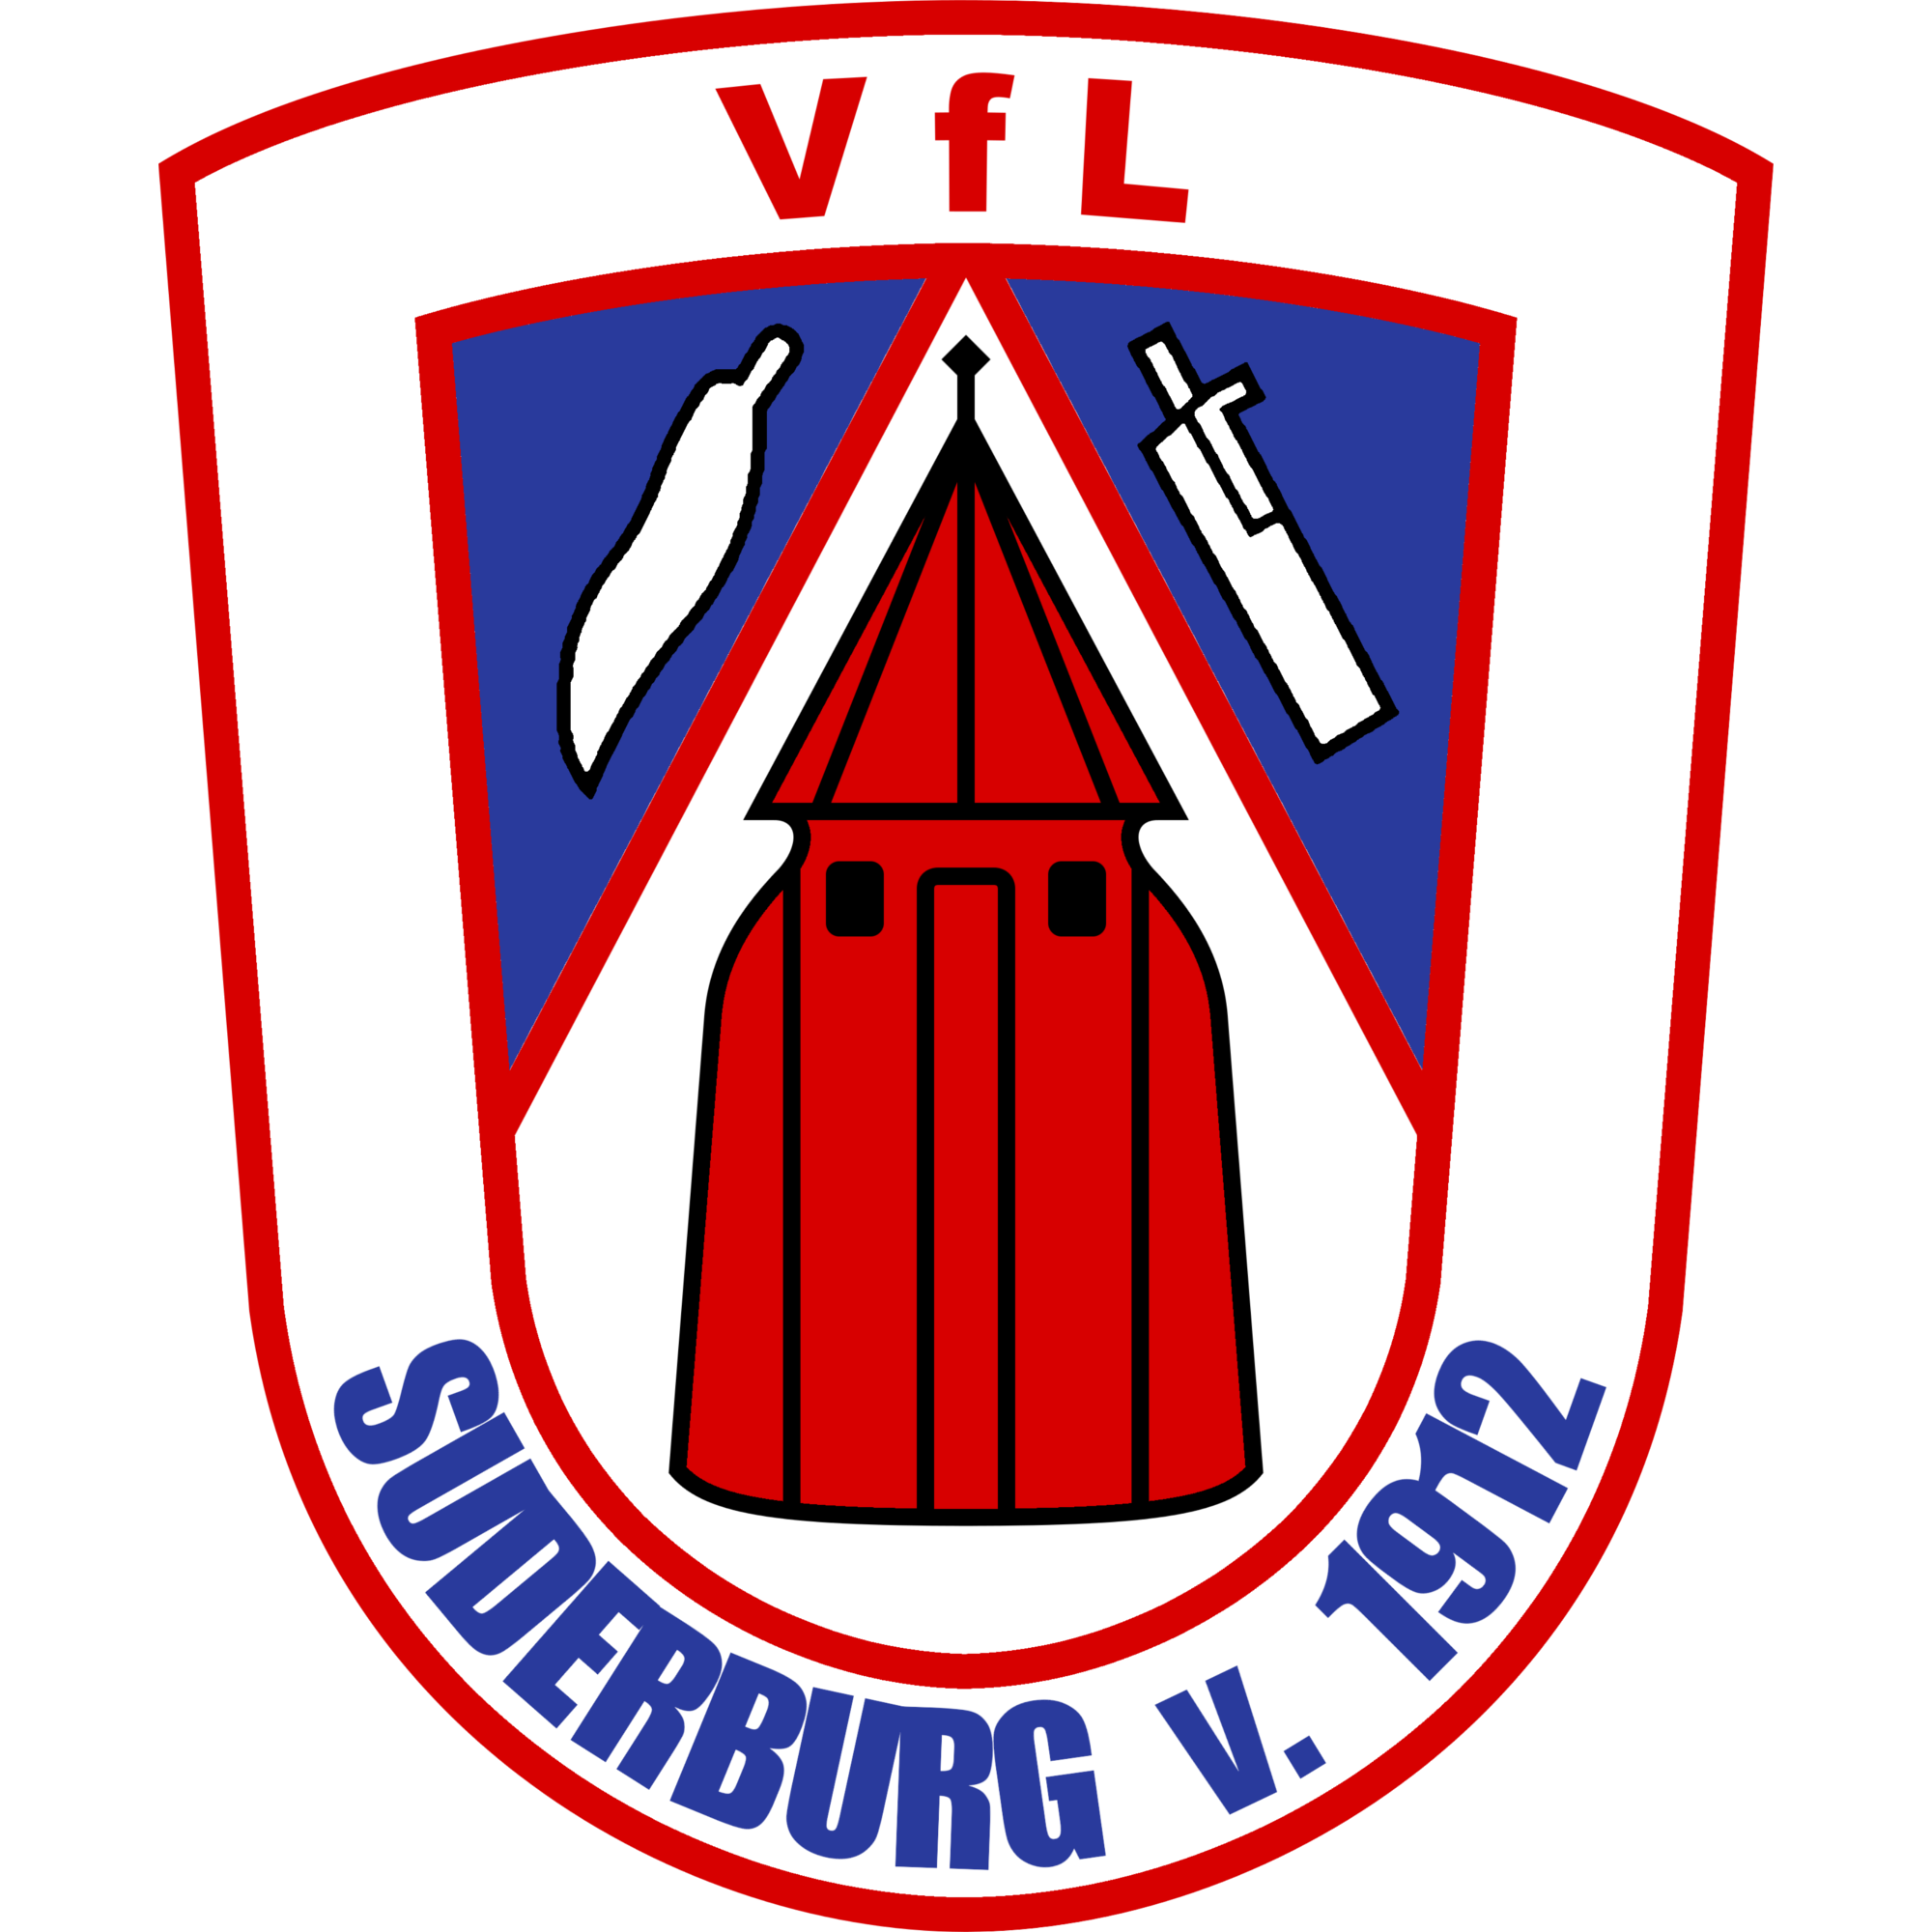 Vfl Suderburg